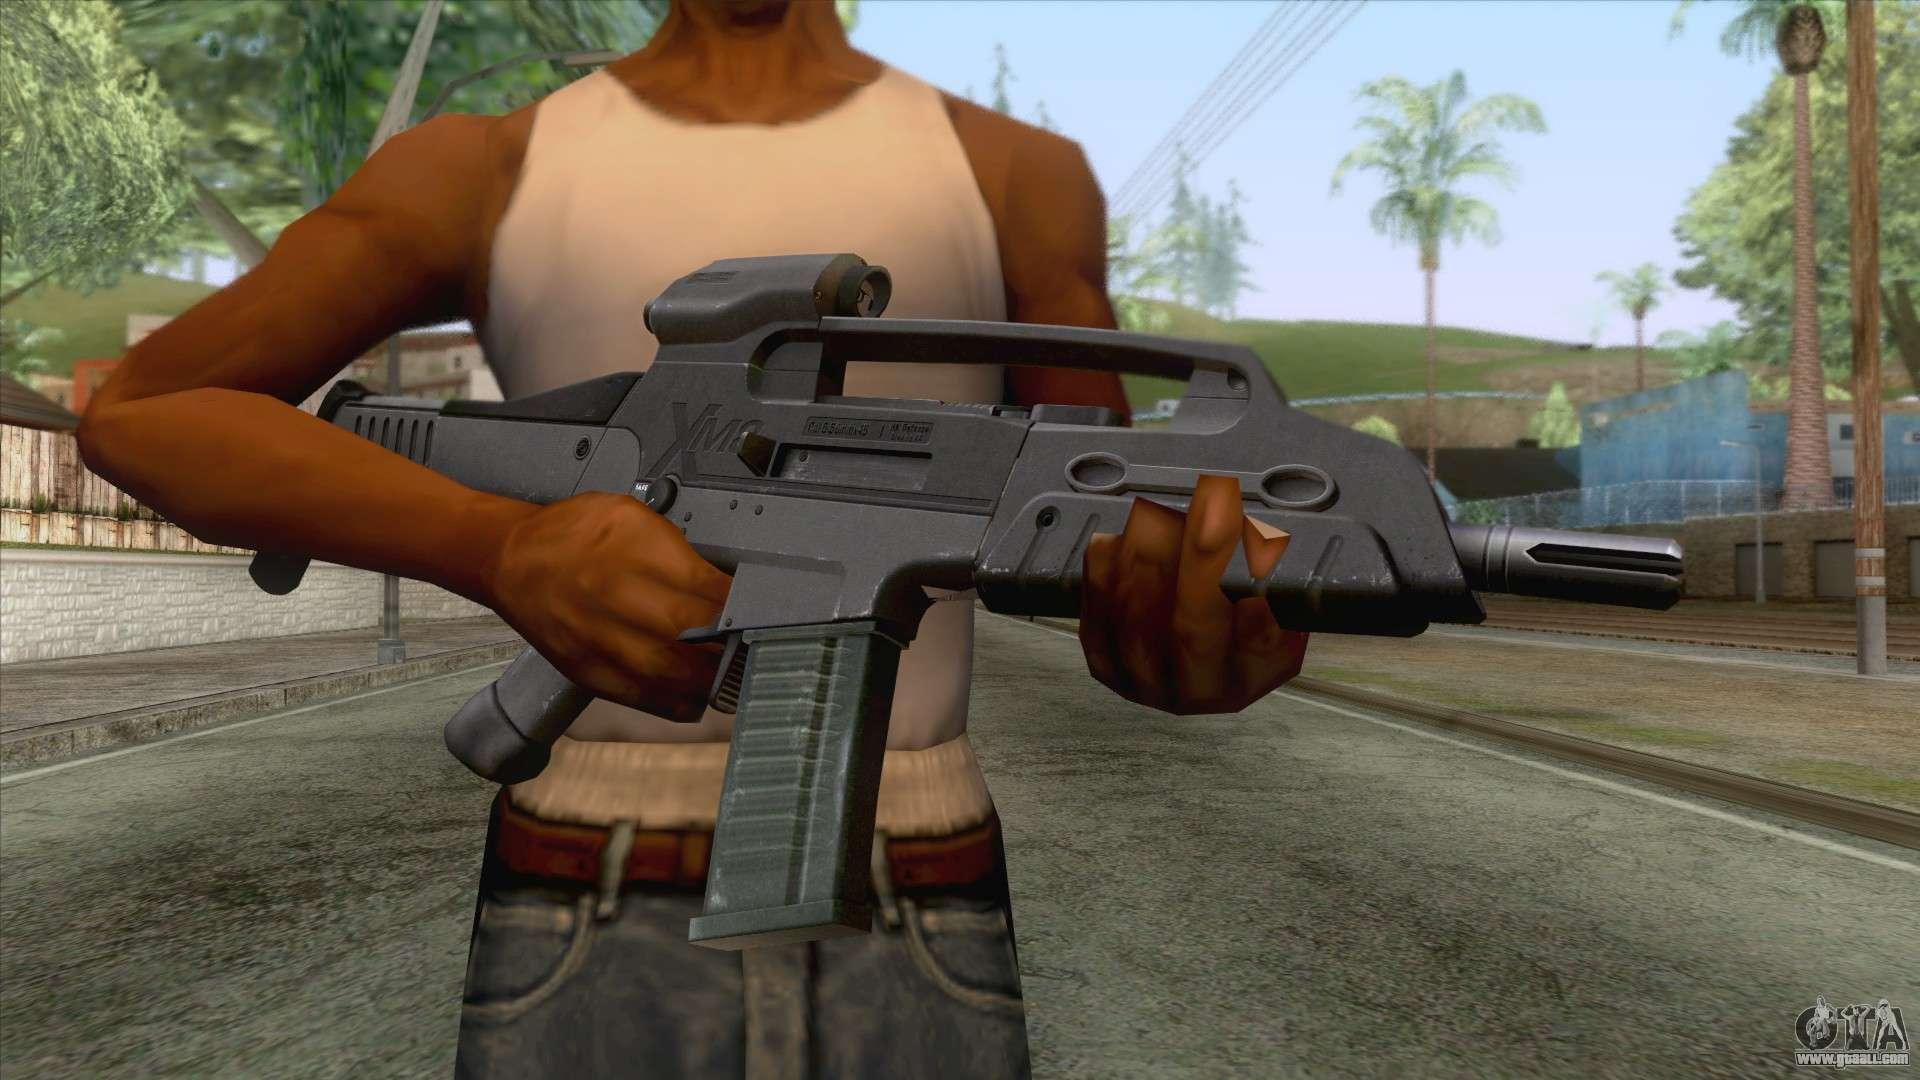 Xm8 Compact Carbine XM8 Compact Rifle Blac...